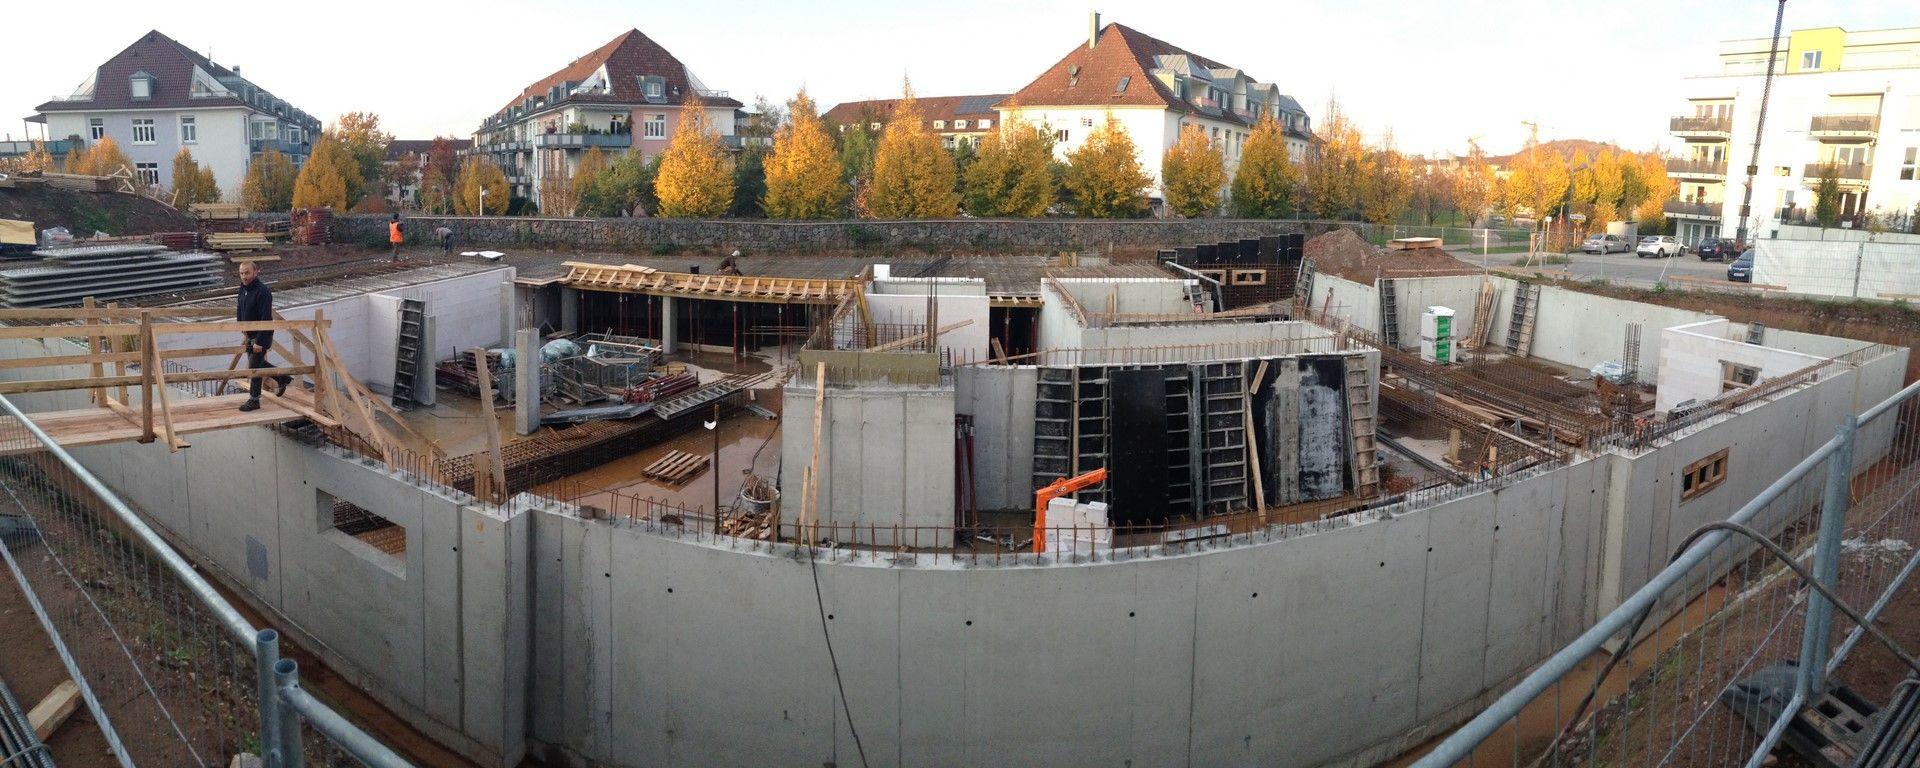 Bautenstand 06.11.2014 Aschaffenburg, Baubeginn, Bau